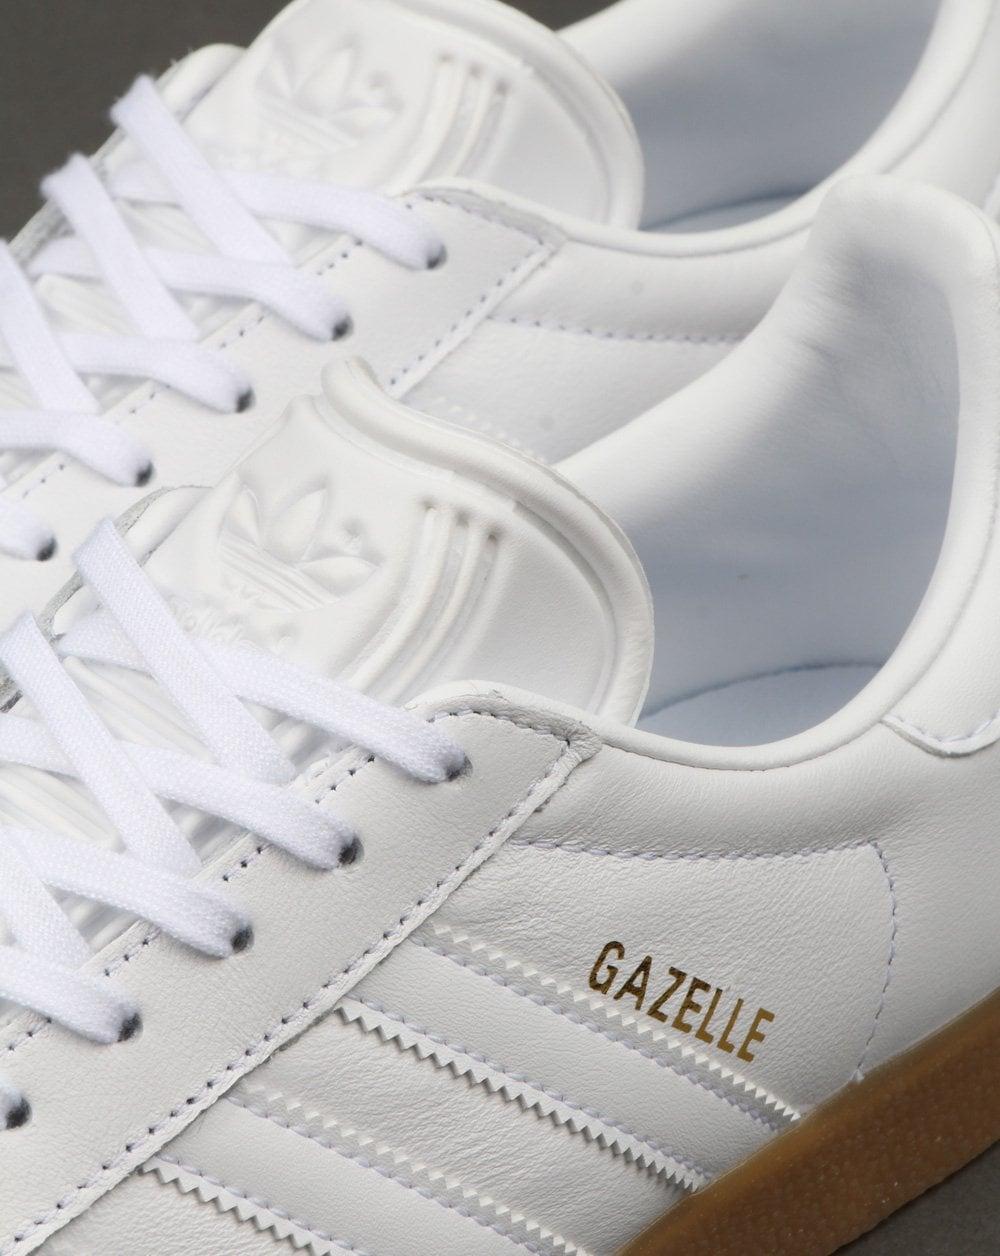 cef7485c9794 Adidas Gazelle Trainers White - Gum